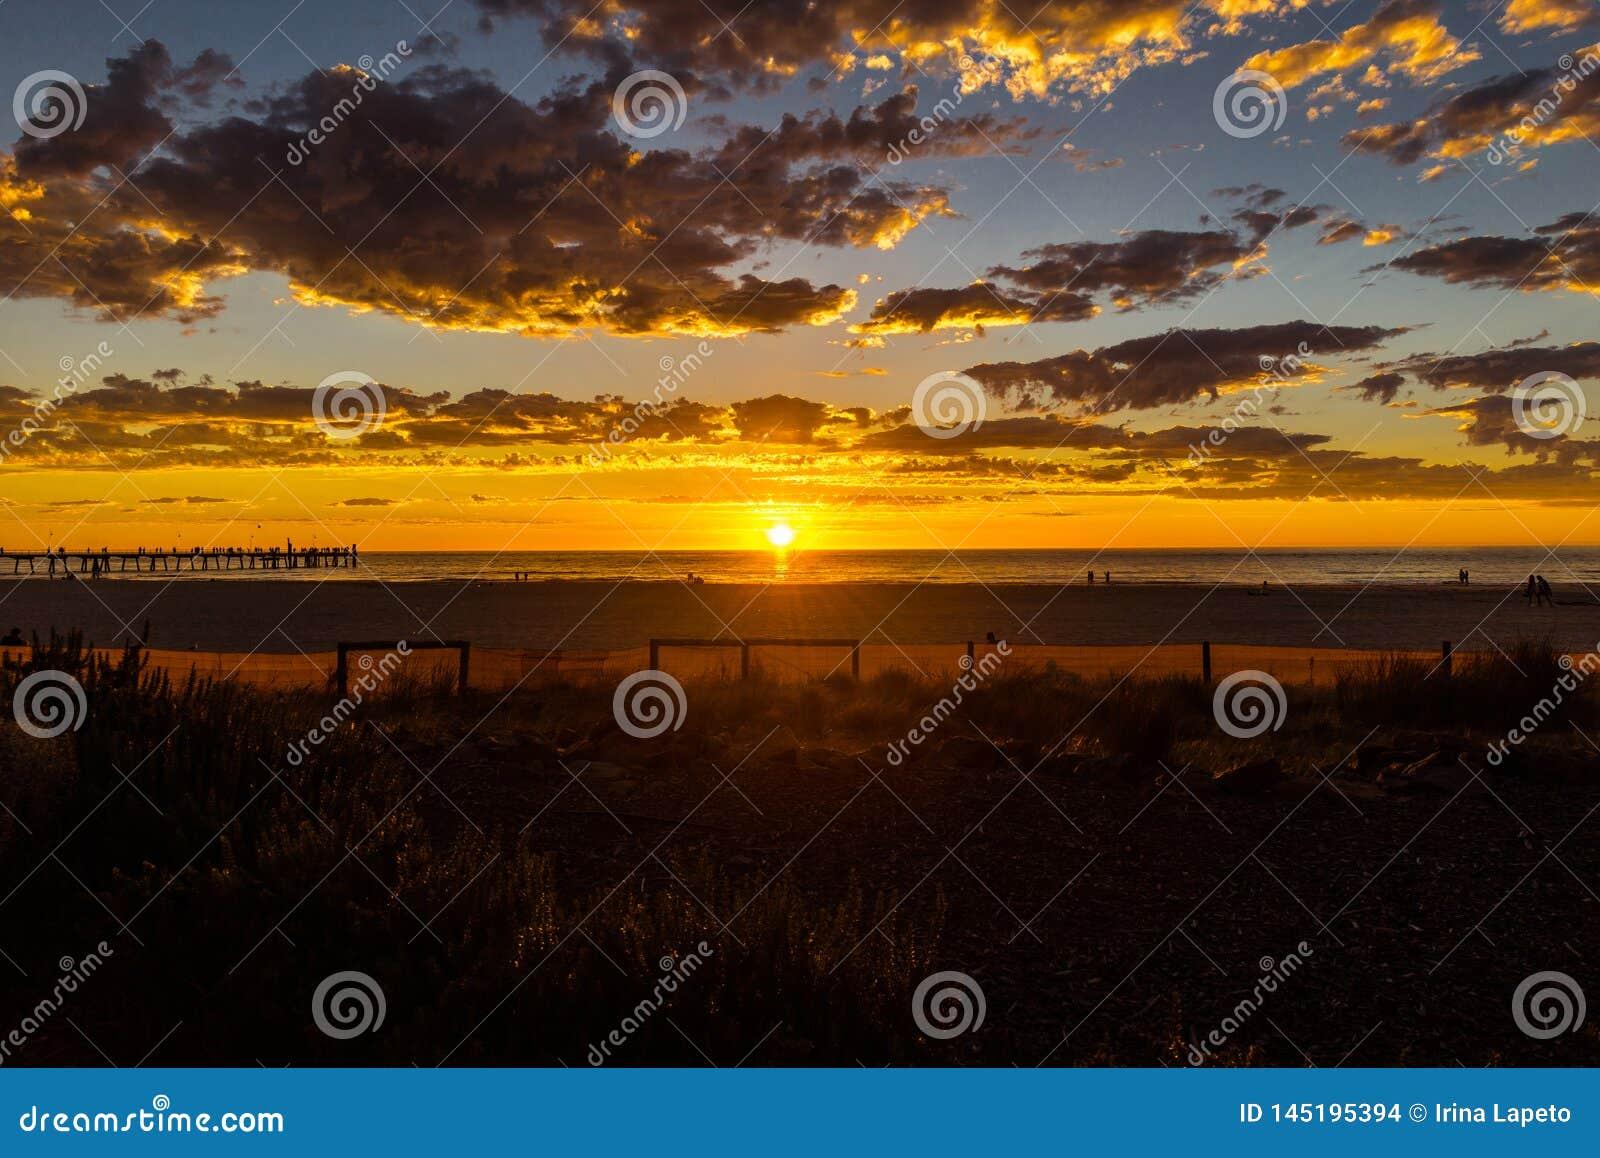 Meerblick des prachtvollen Sonnenuntergangs an Glenelg-Strand, Adelaide, Australien